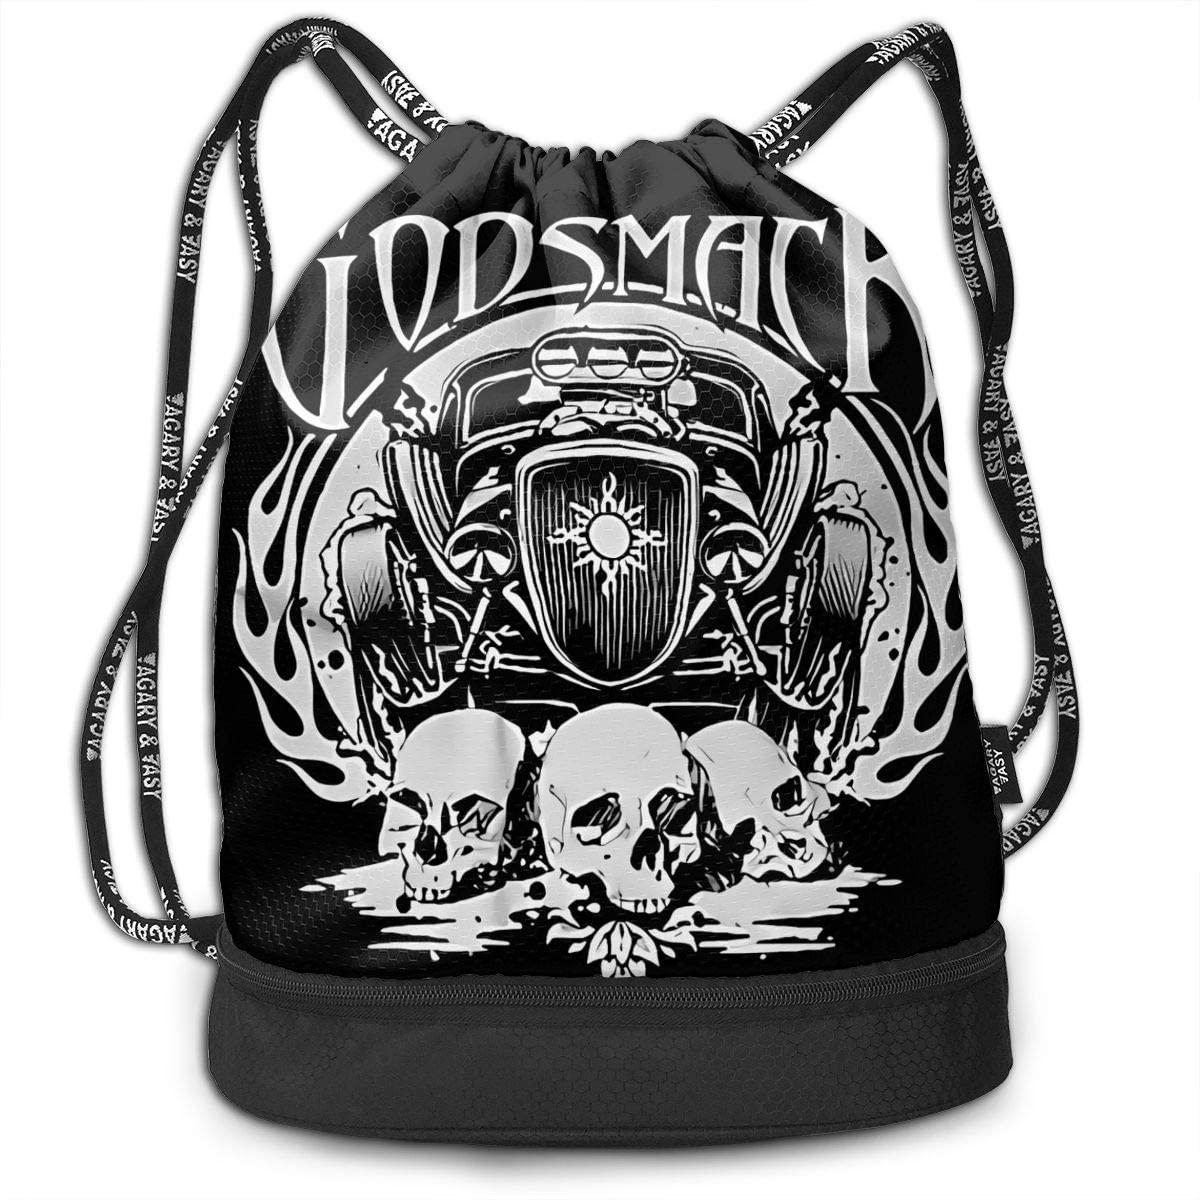 Funny Classic Godsmack. Multifunctional Travel Sports And Leisure Drawstring Backpack